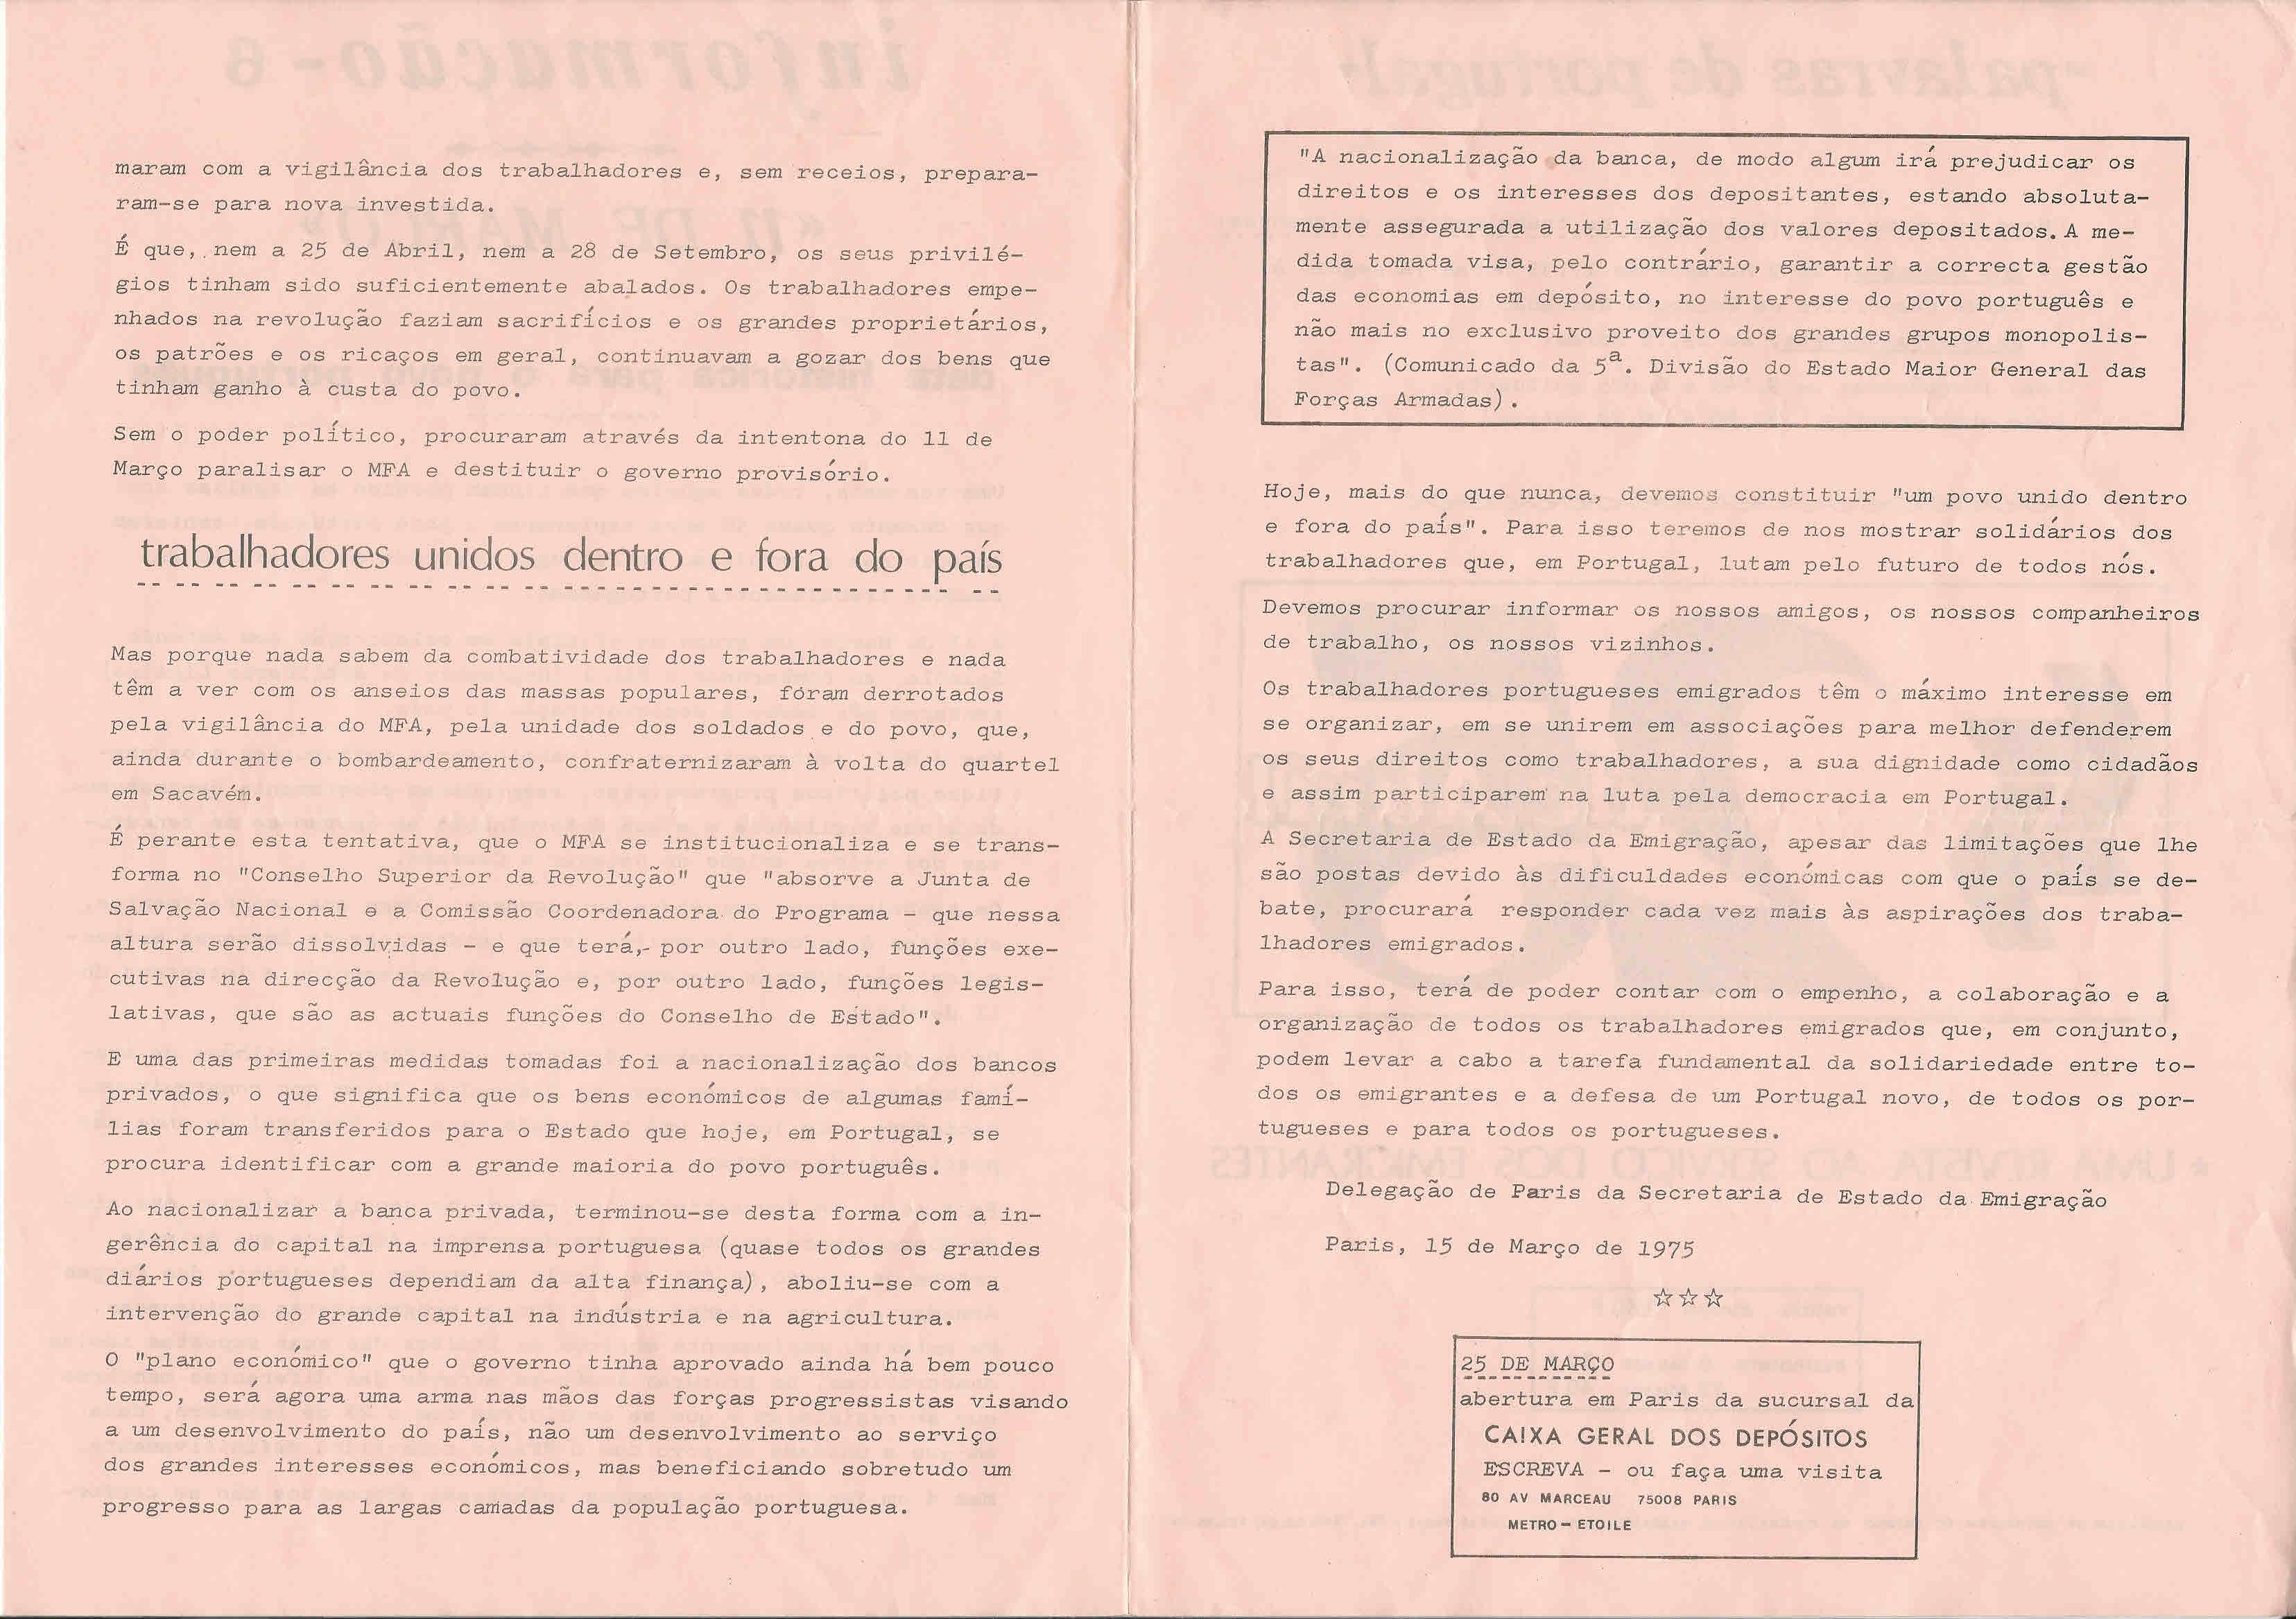 Secretaria de estado da emigrao delegao em paris informaes carregue aqui para imprimir opens in new window fandeluxe Gallery